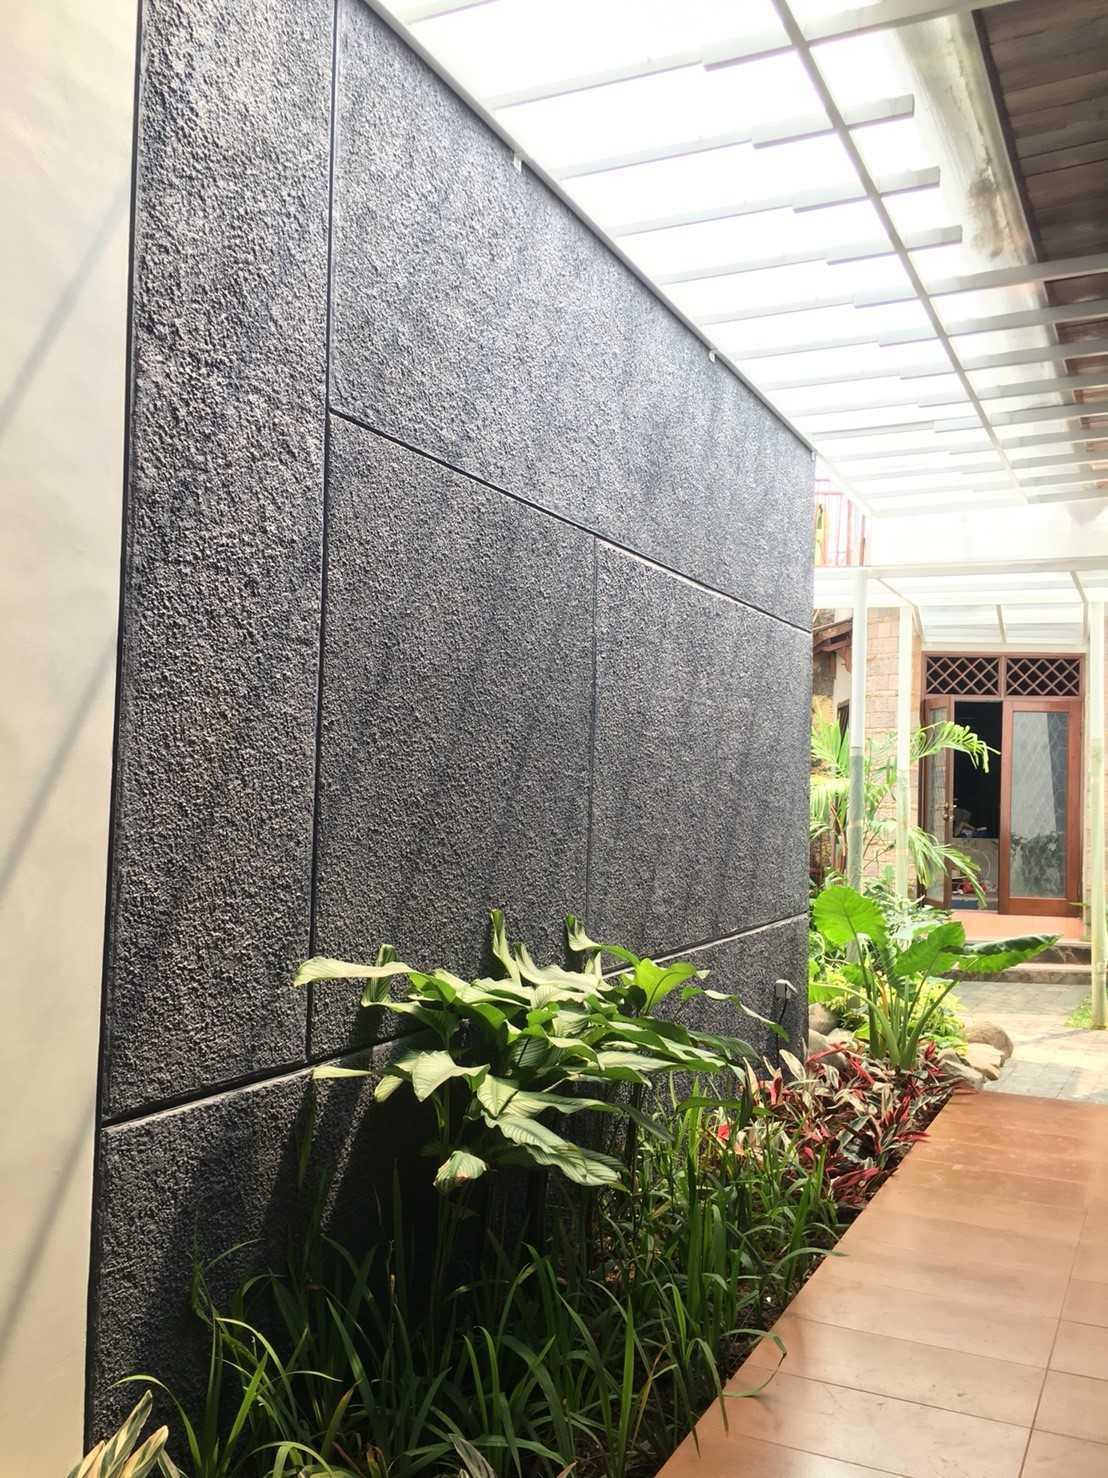 Ho.la Studio Arsitektur K House Bekasi Bar., Kota Bks, Jawa Barat, Indonesia Bekasi Bar., Kota Bks, Jawa Barat, Indonesia Hola-Studio-Arsitektur-K-House   68923